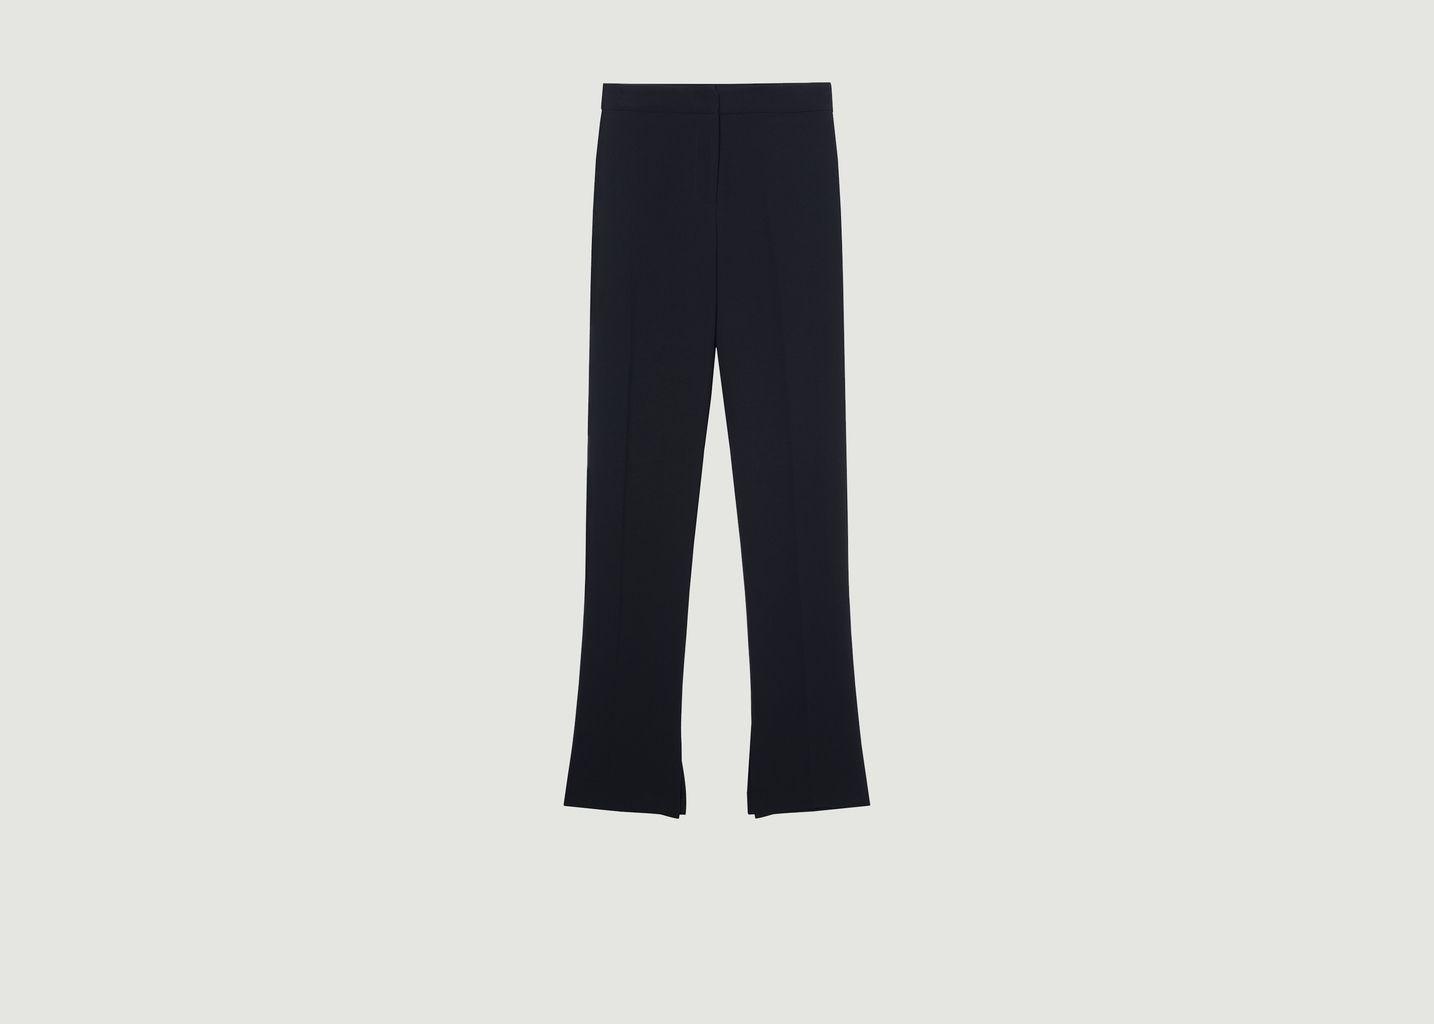 Pantalon Elle fendu - Musier